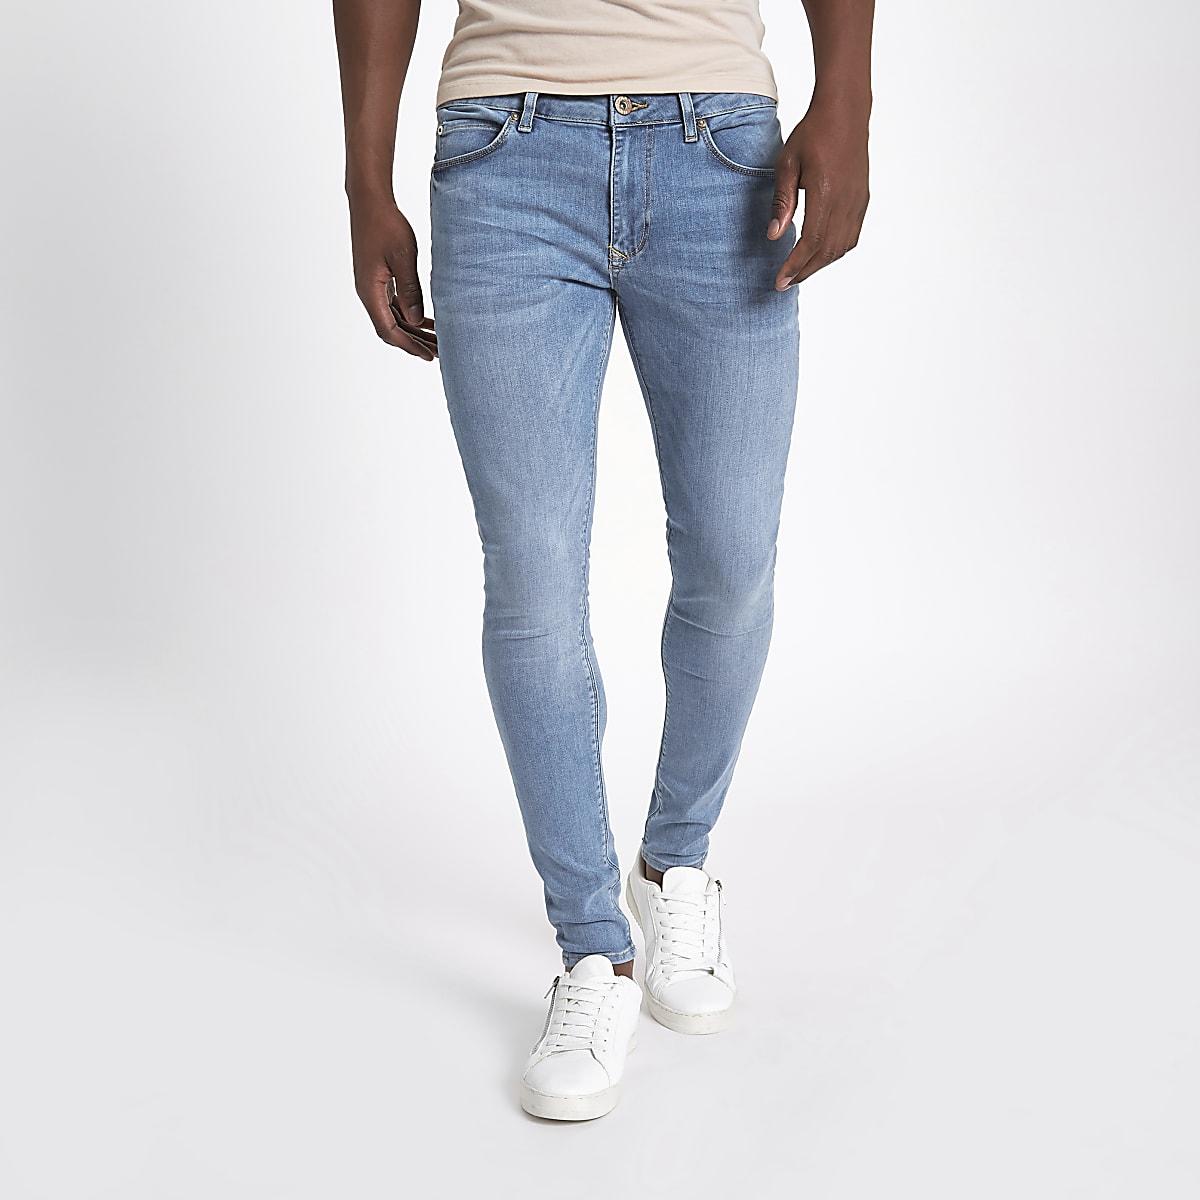 baa52a1f5a2 Light blue Ollie super skinny spray on jeans - Spray On - Jeans - men